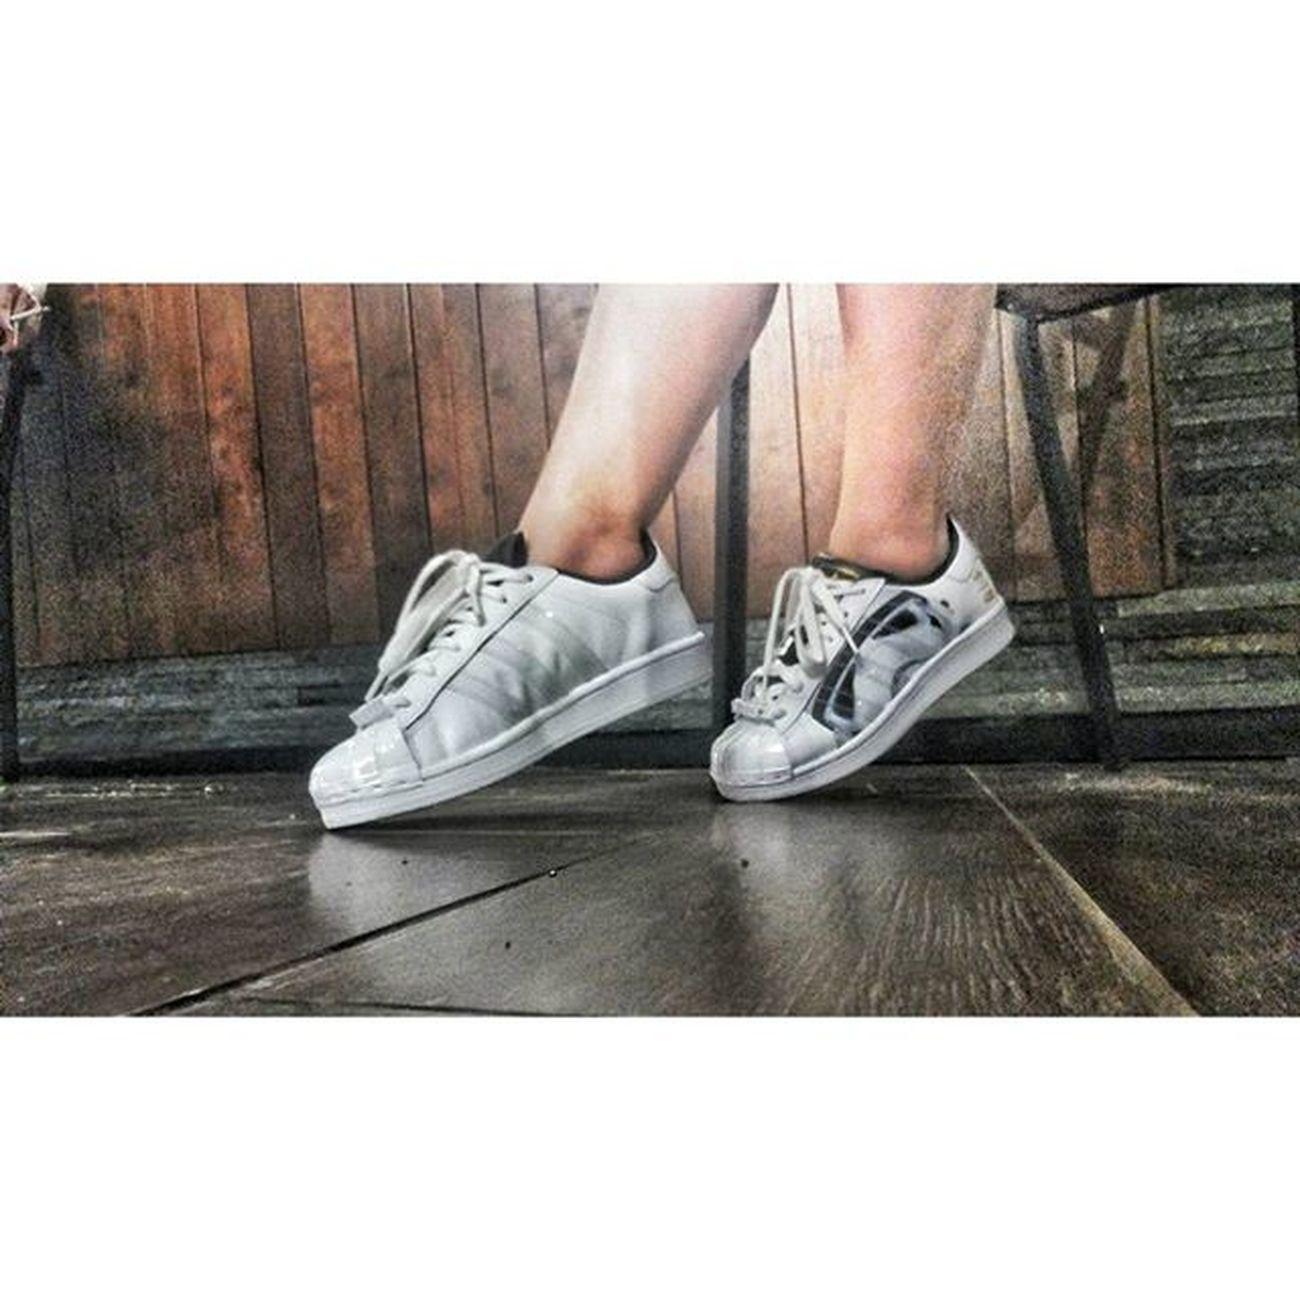 Adidas Adidasoriginals Adidassuperstar Adidasstarwars 3foil_id 3foil 3foilID Starwars Starwarsfans Starwarsday Stormtrooper HDR Hdr_lovers Hdr_pics Sneakers Sneakerindo Sneakerhead  SneakerPorn